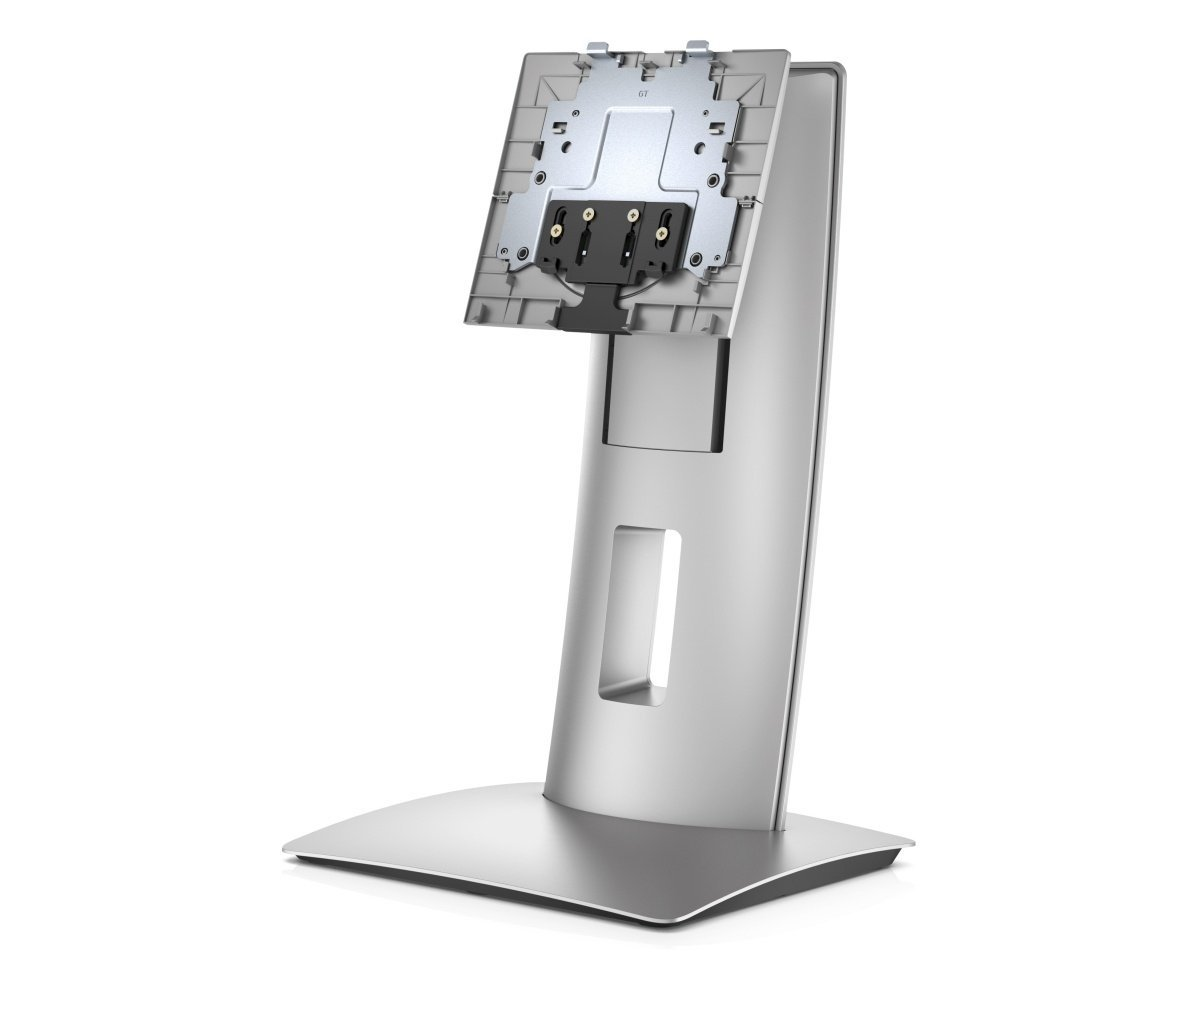 HP 800/705/600 G2 AIO Adjustable Height (N7H08AA)